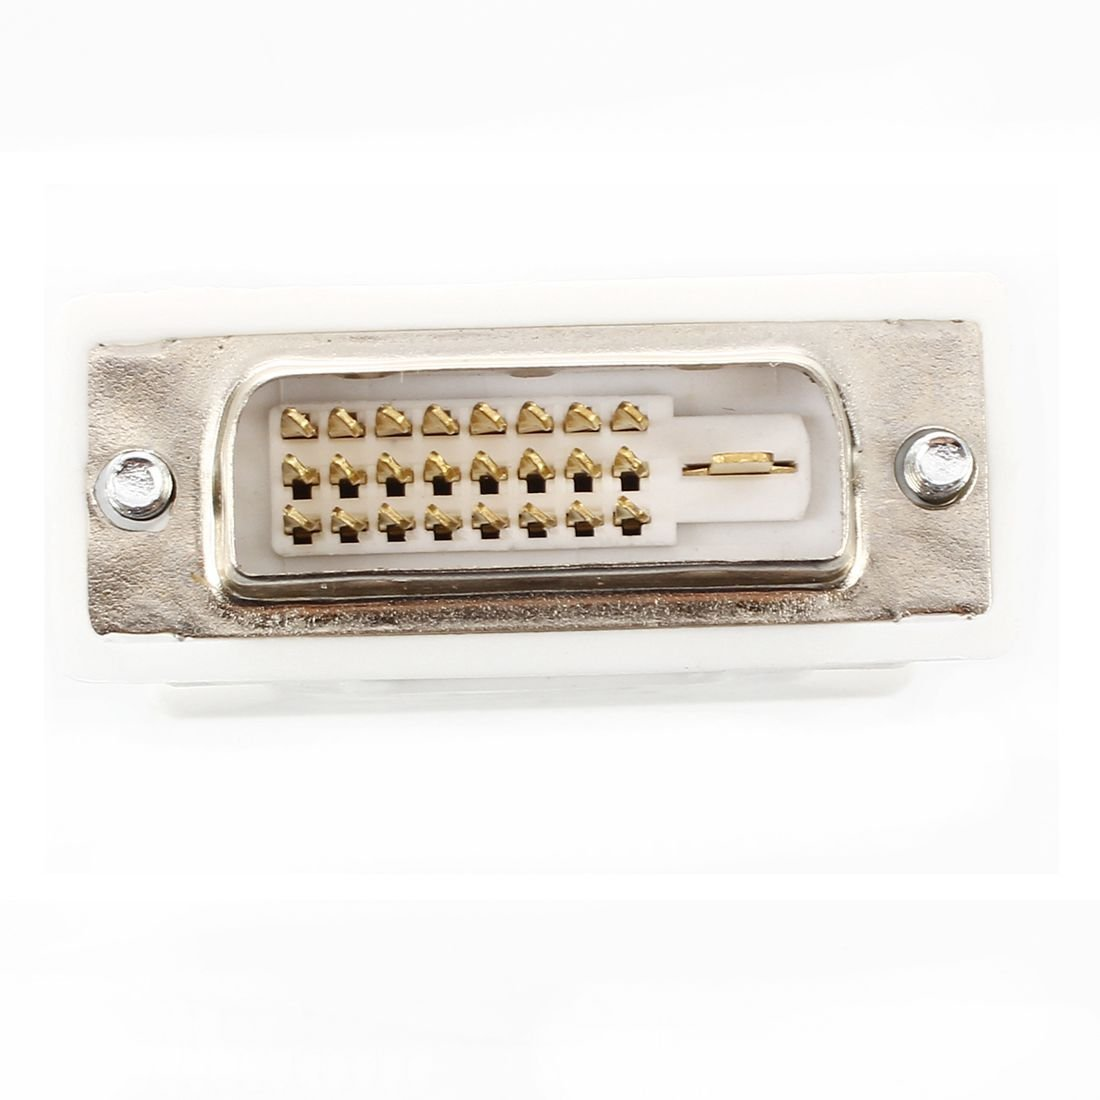 to female VGA Adapter DVI - D 24 1 15-pin SODIAL DVI male adapter R